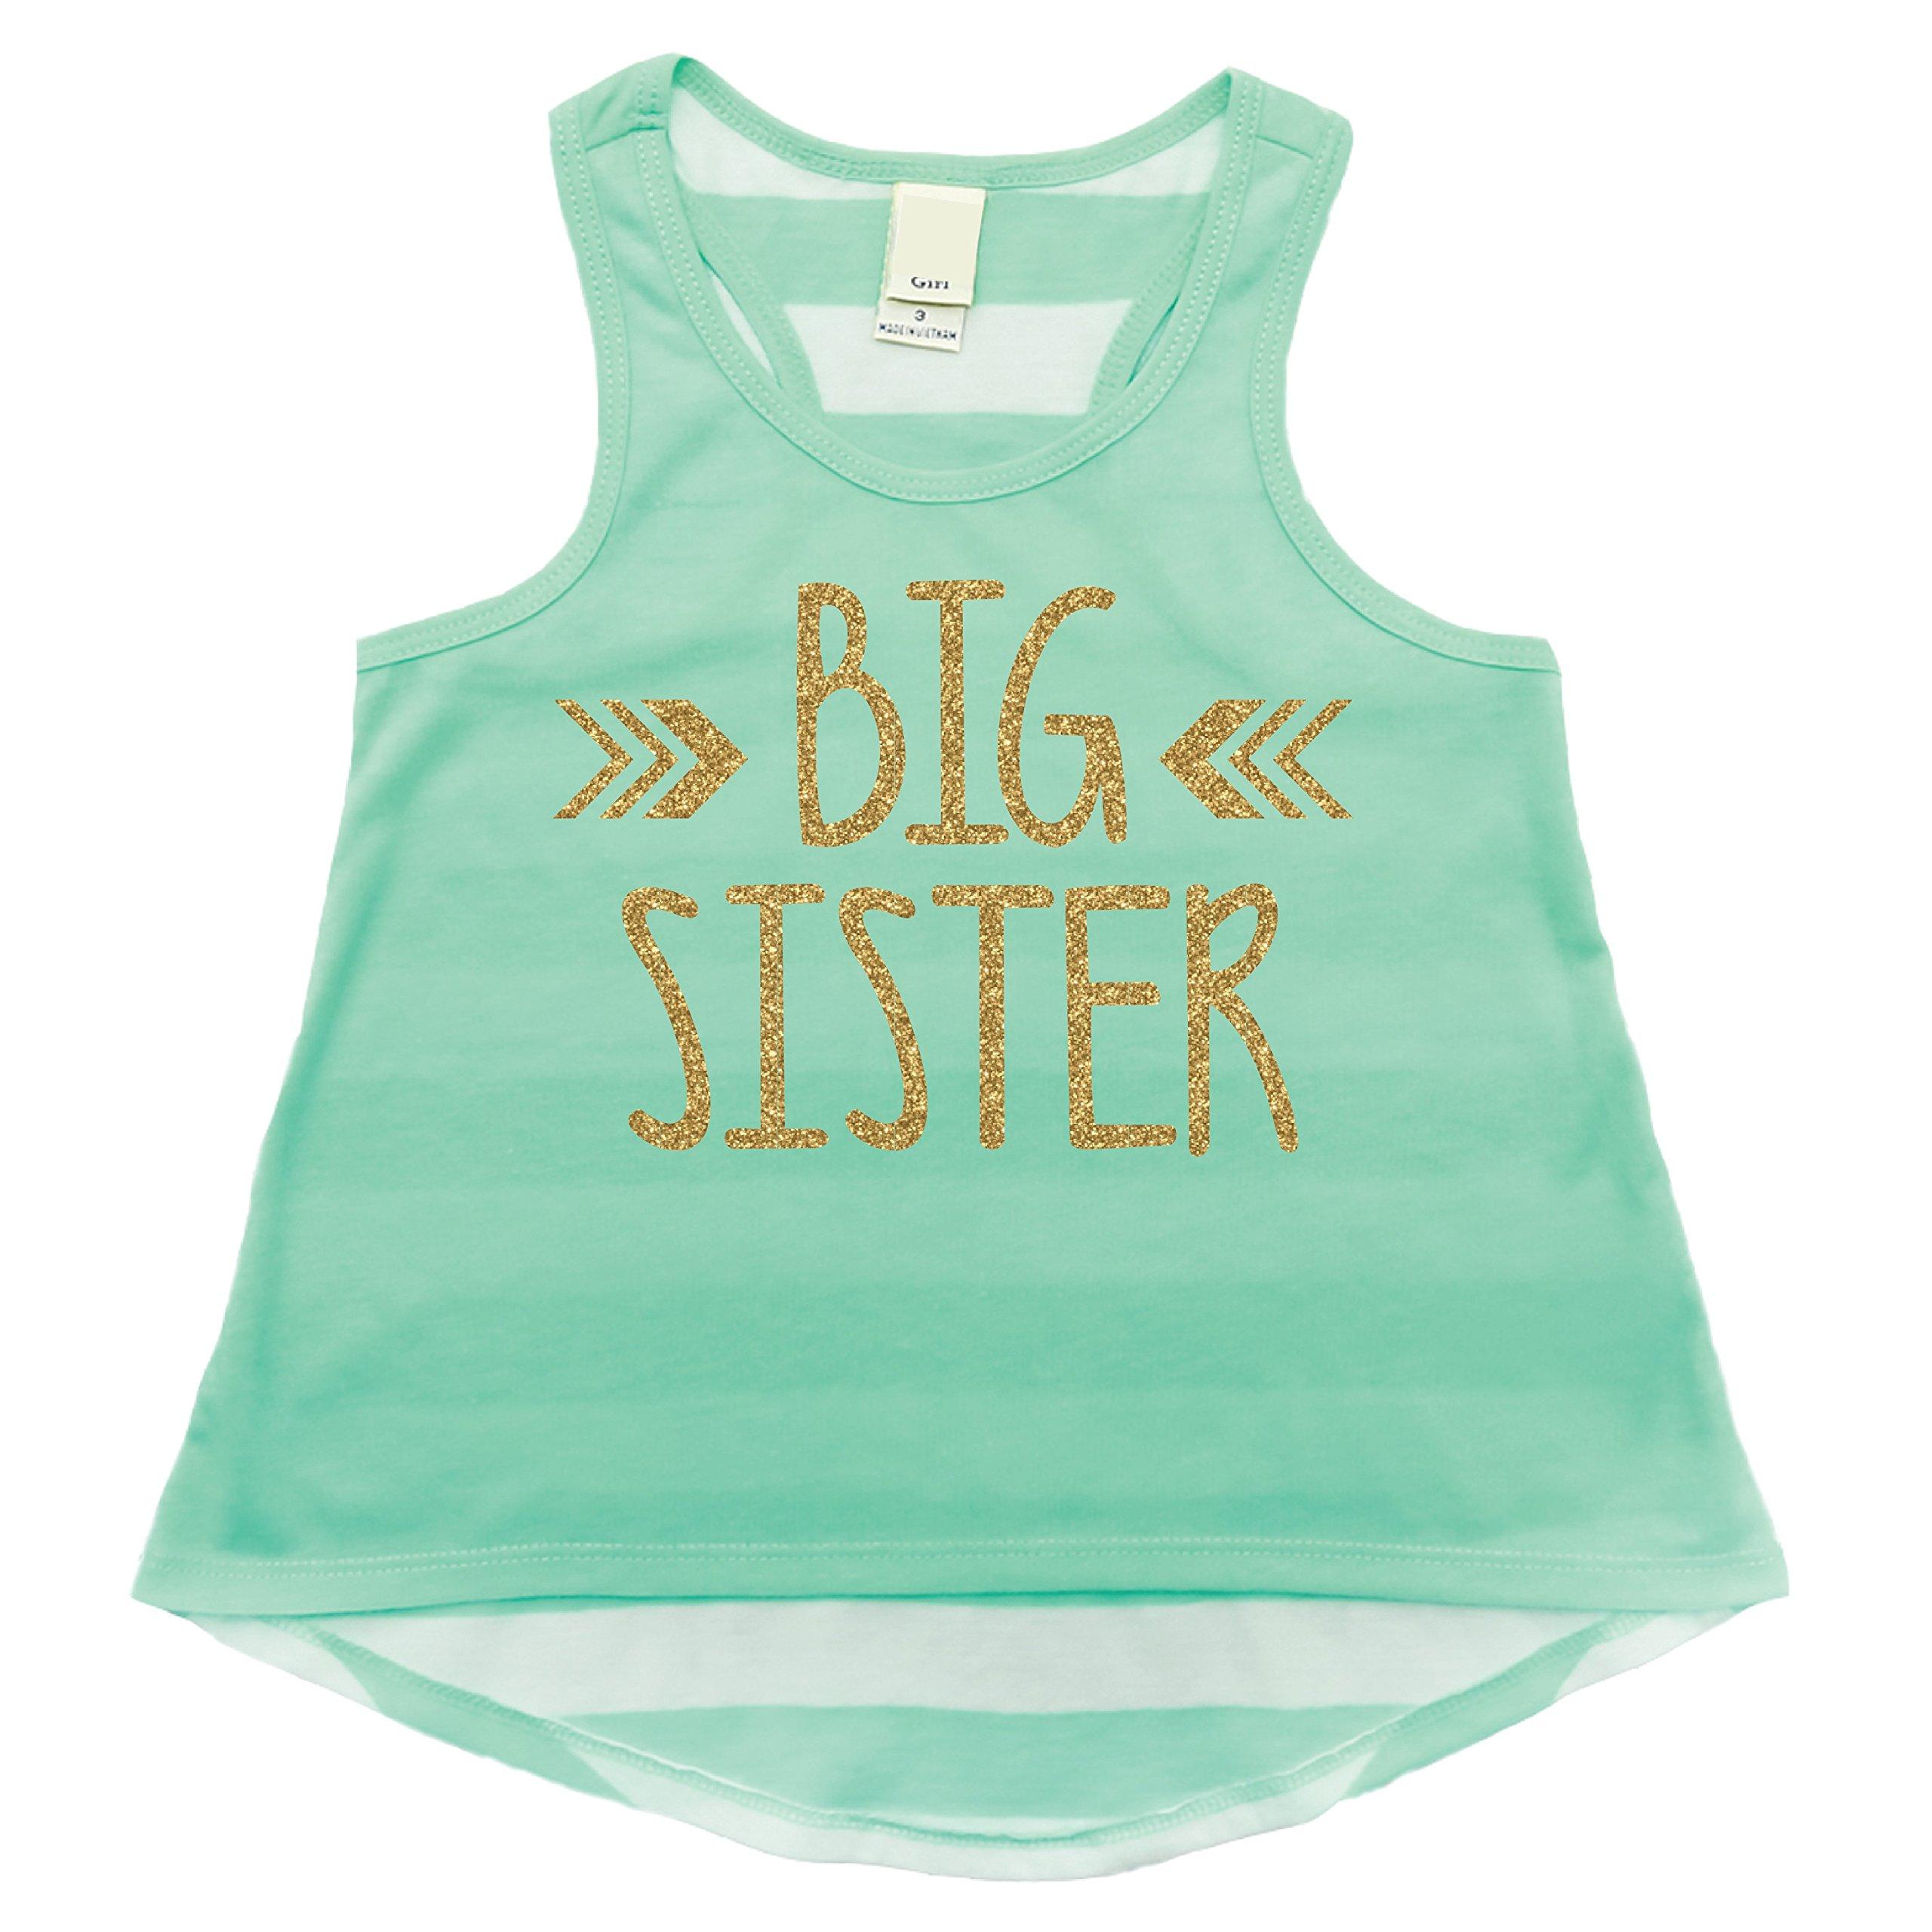 Big Sister Shirt, Trendy Girl Clothes, Big Sister Tank Top (4T)